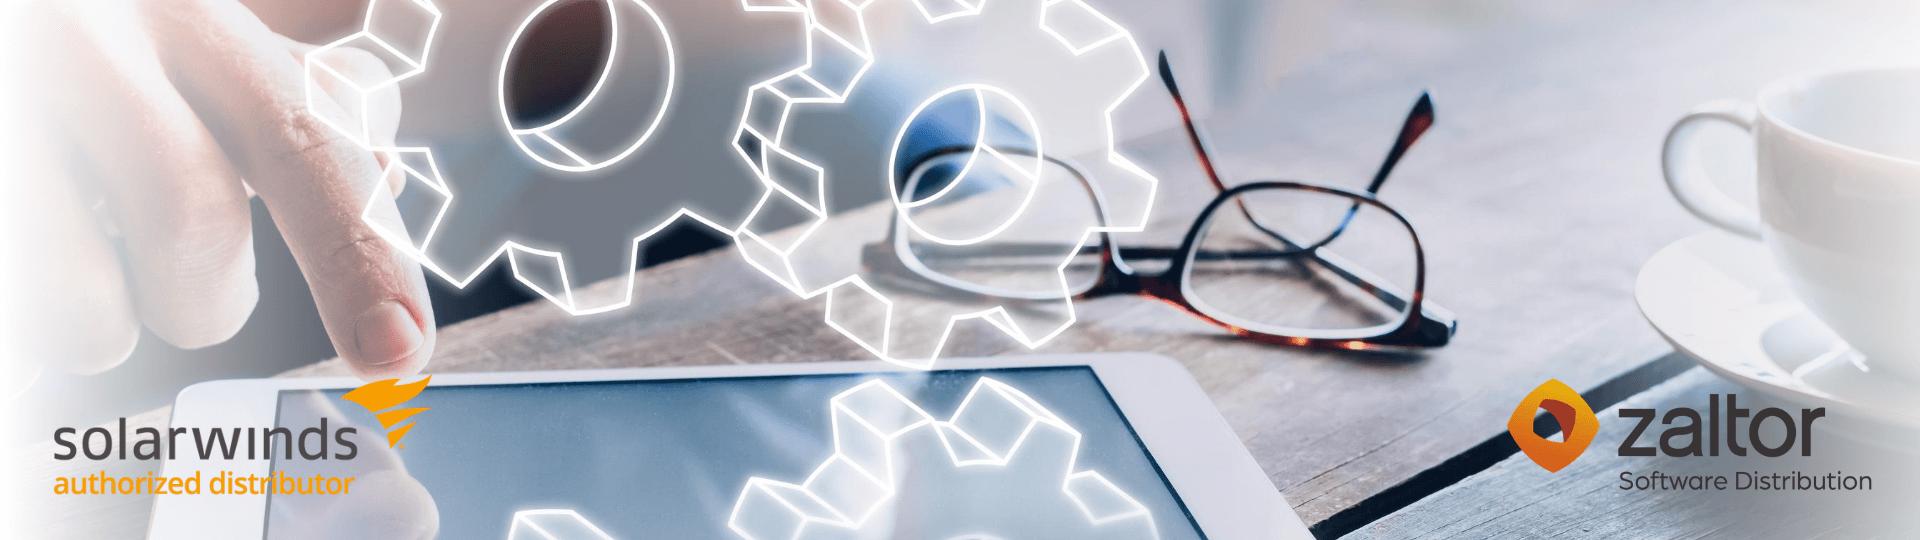 Solarwinds RMM automatizacion esencial MSP